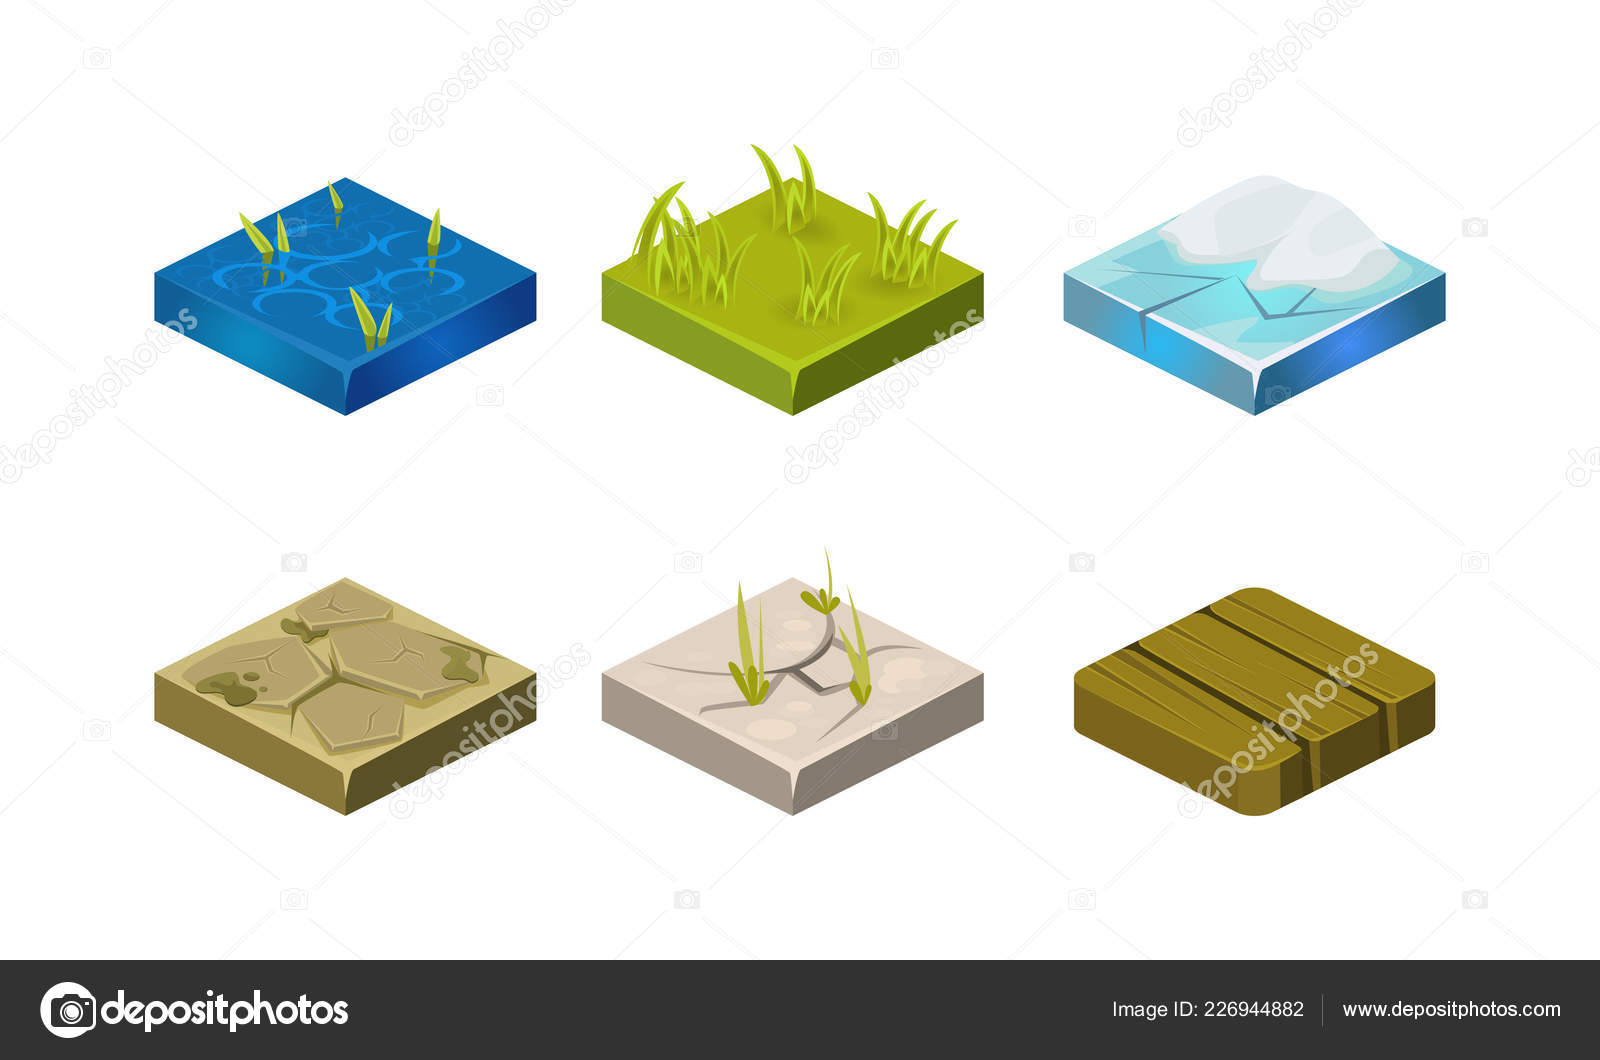 Platforms of different ground textures set, water, stone